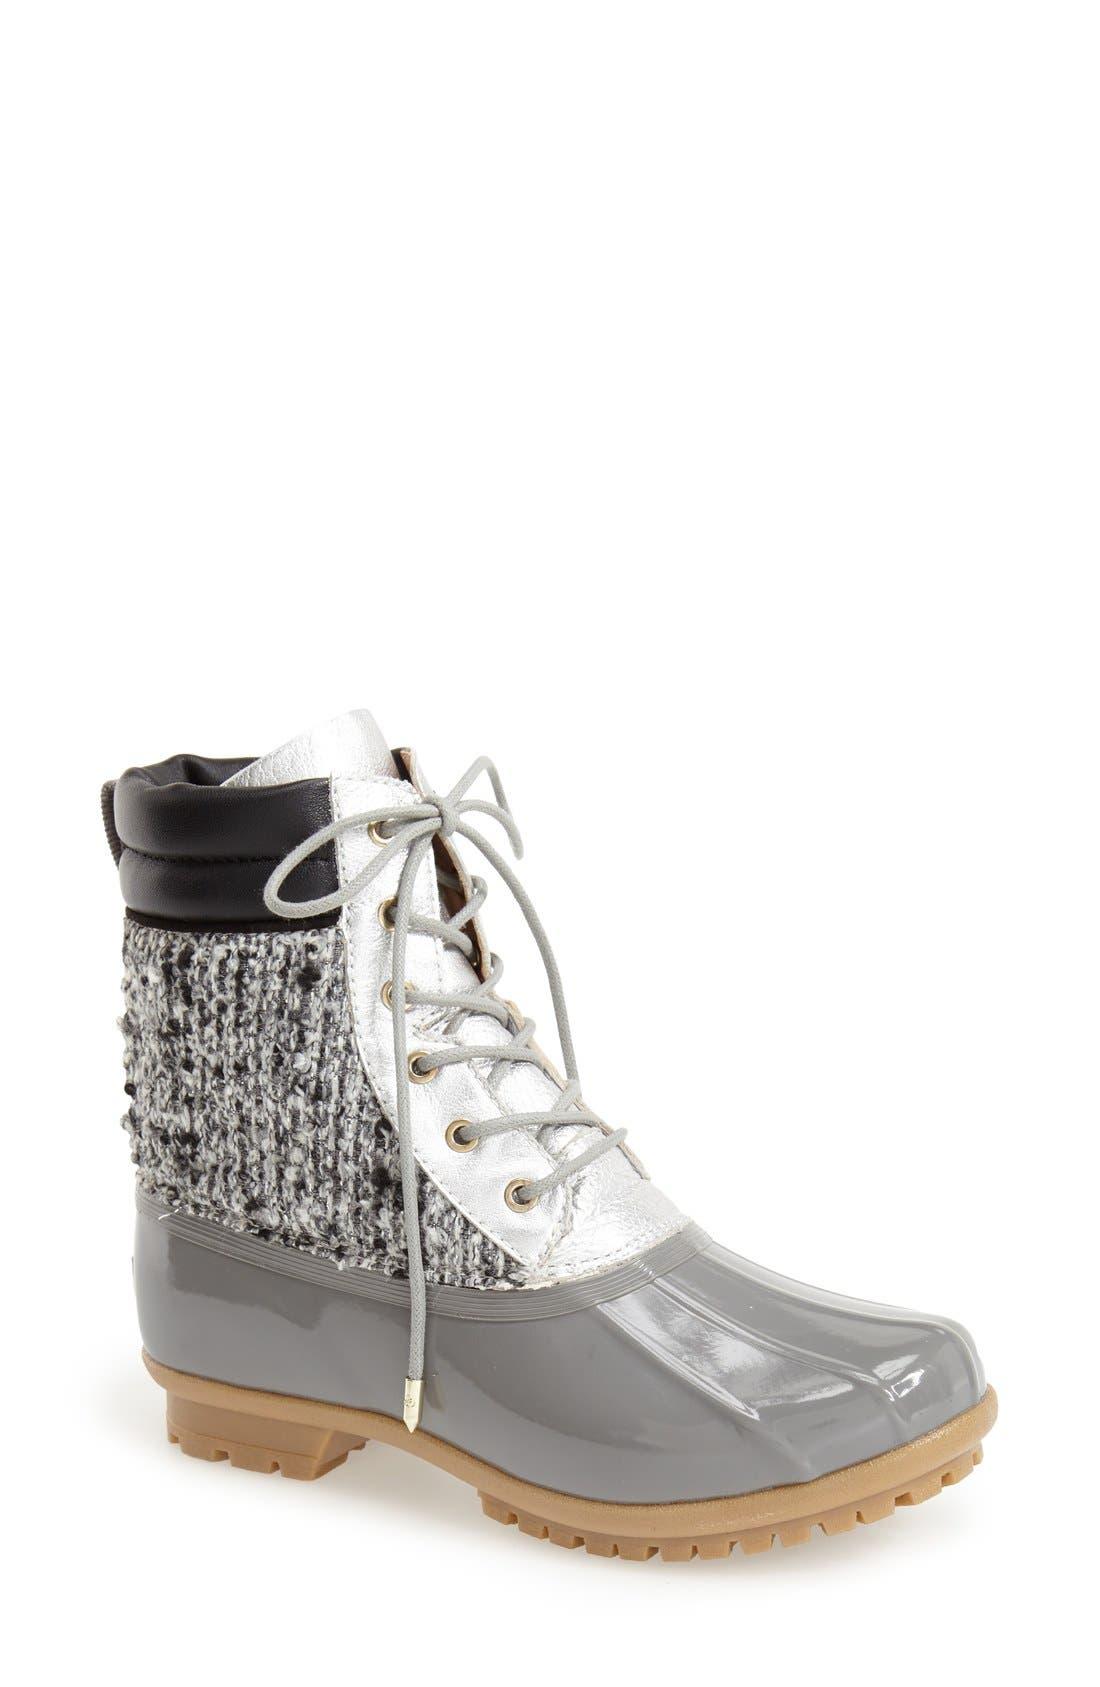 Main Image - Sam Edelman'Caldwell' Rain Boot (Women)